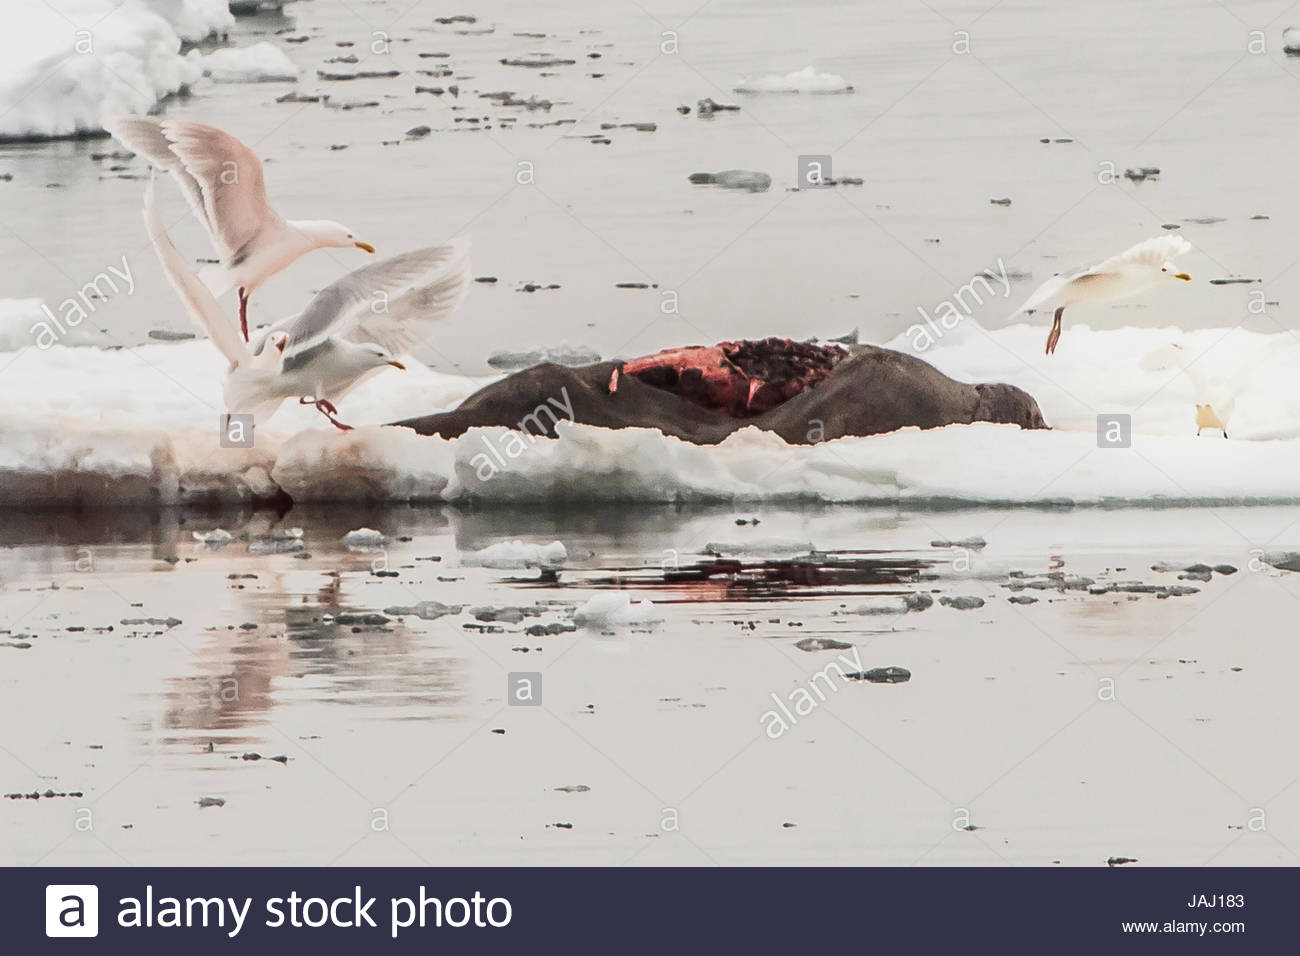 Glaucous gulls, Larus hyperboreus, scavenging a bearded seal carcass left by a polar bear. Stock Photo